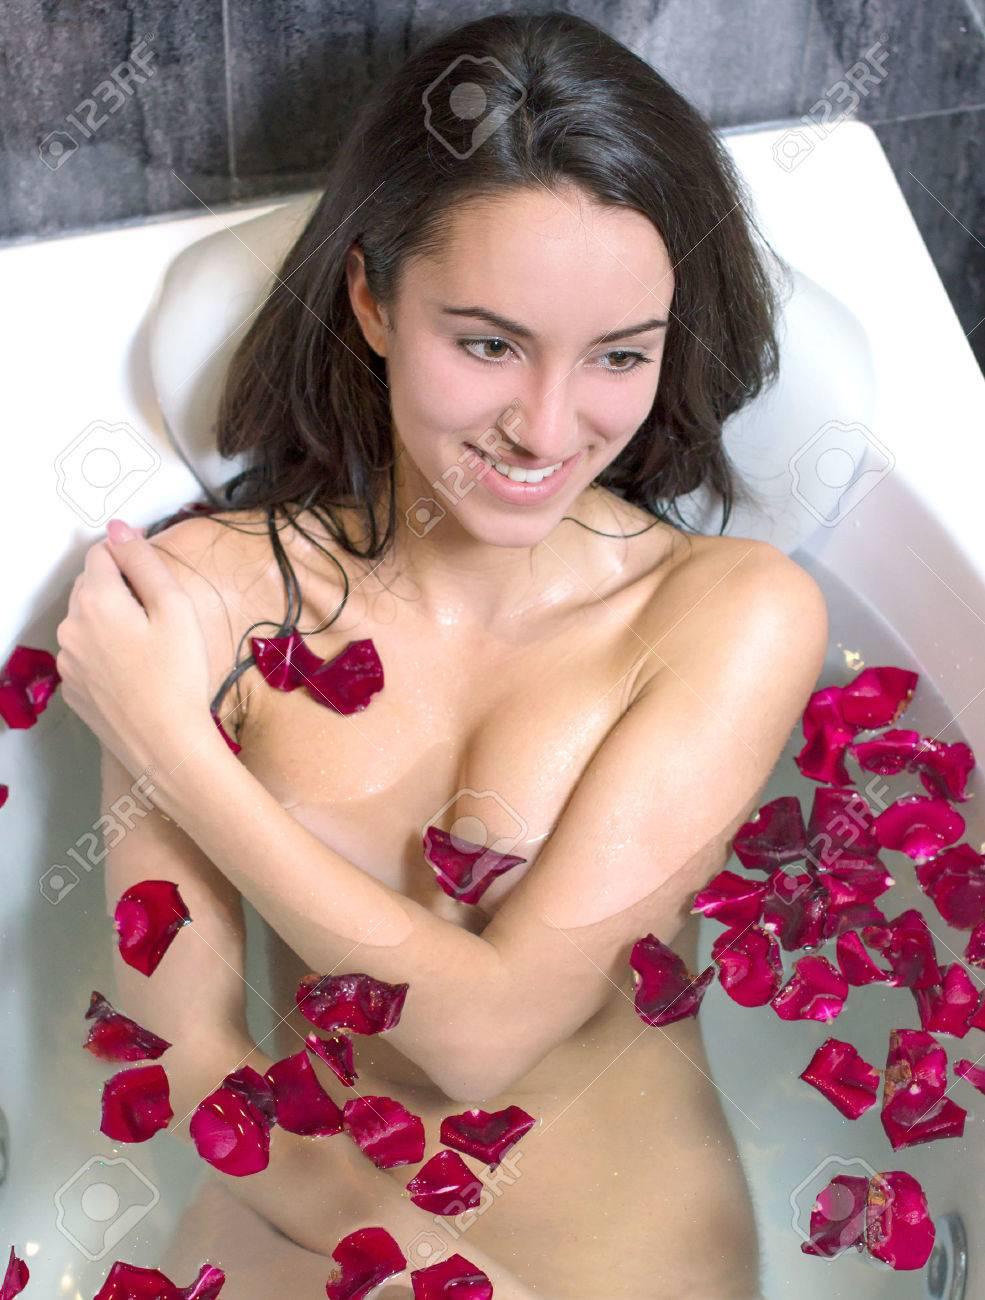 Фото девушек в ванне с лепестками роз 19 фотография